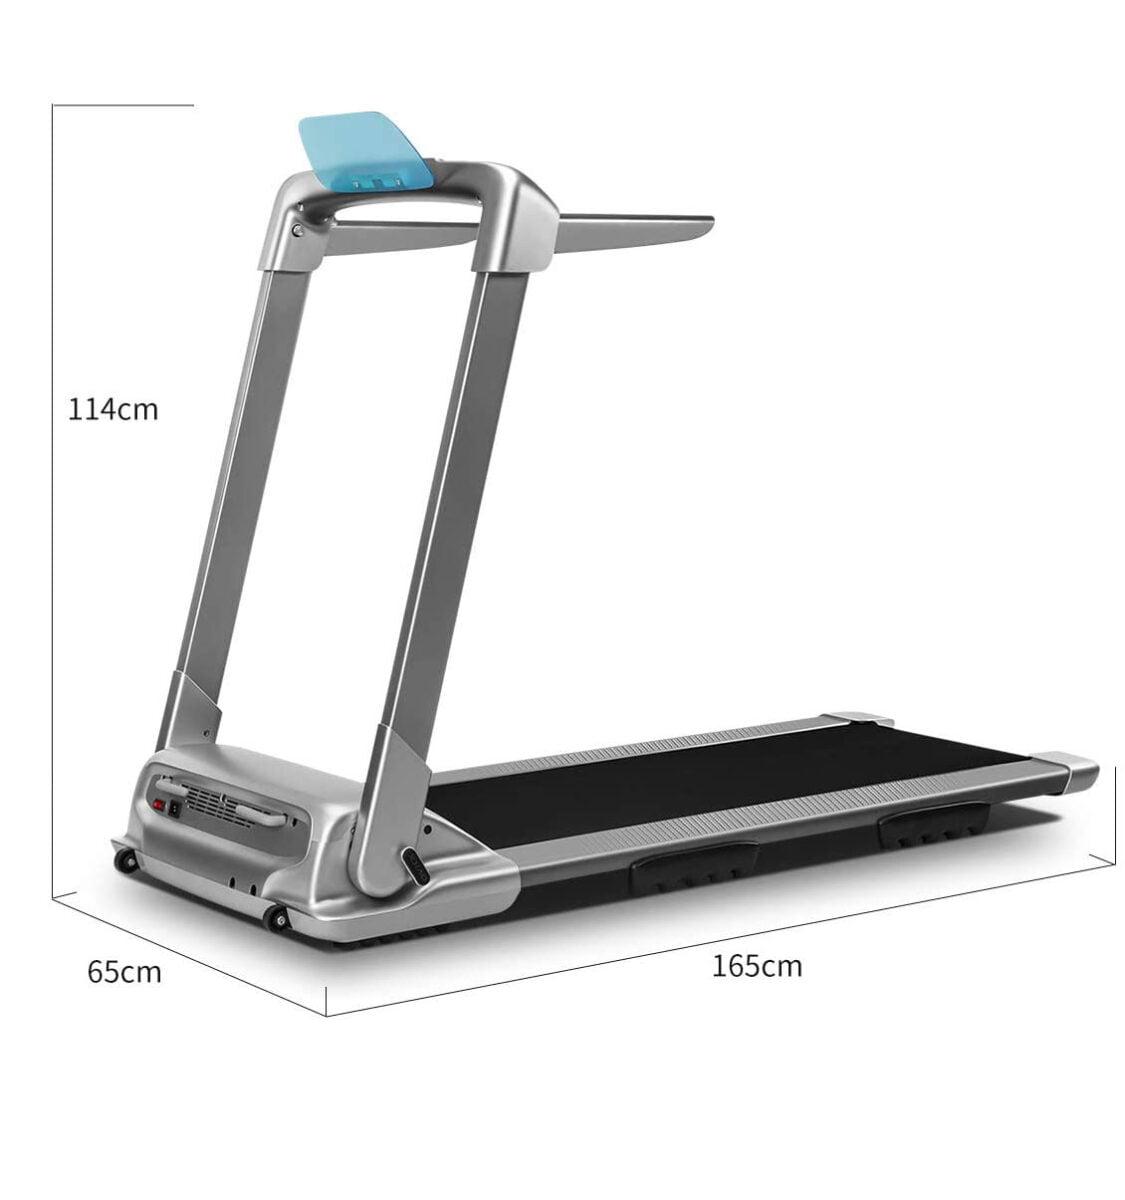 OVICX Q2S Folding Portable Treadmill Voucher Code